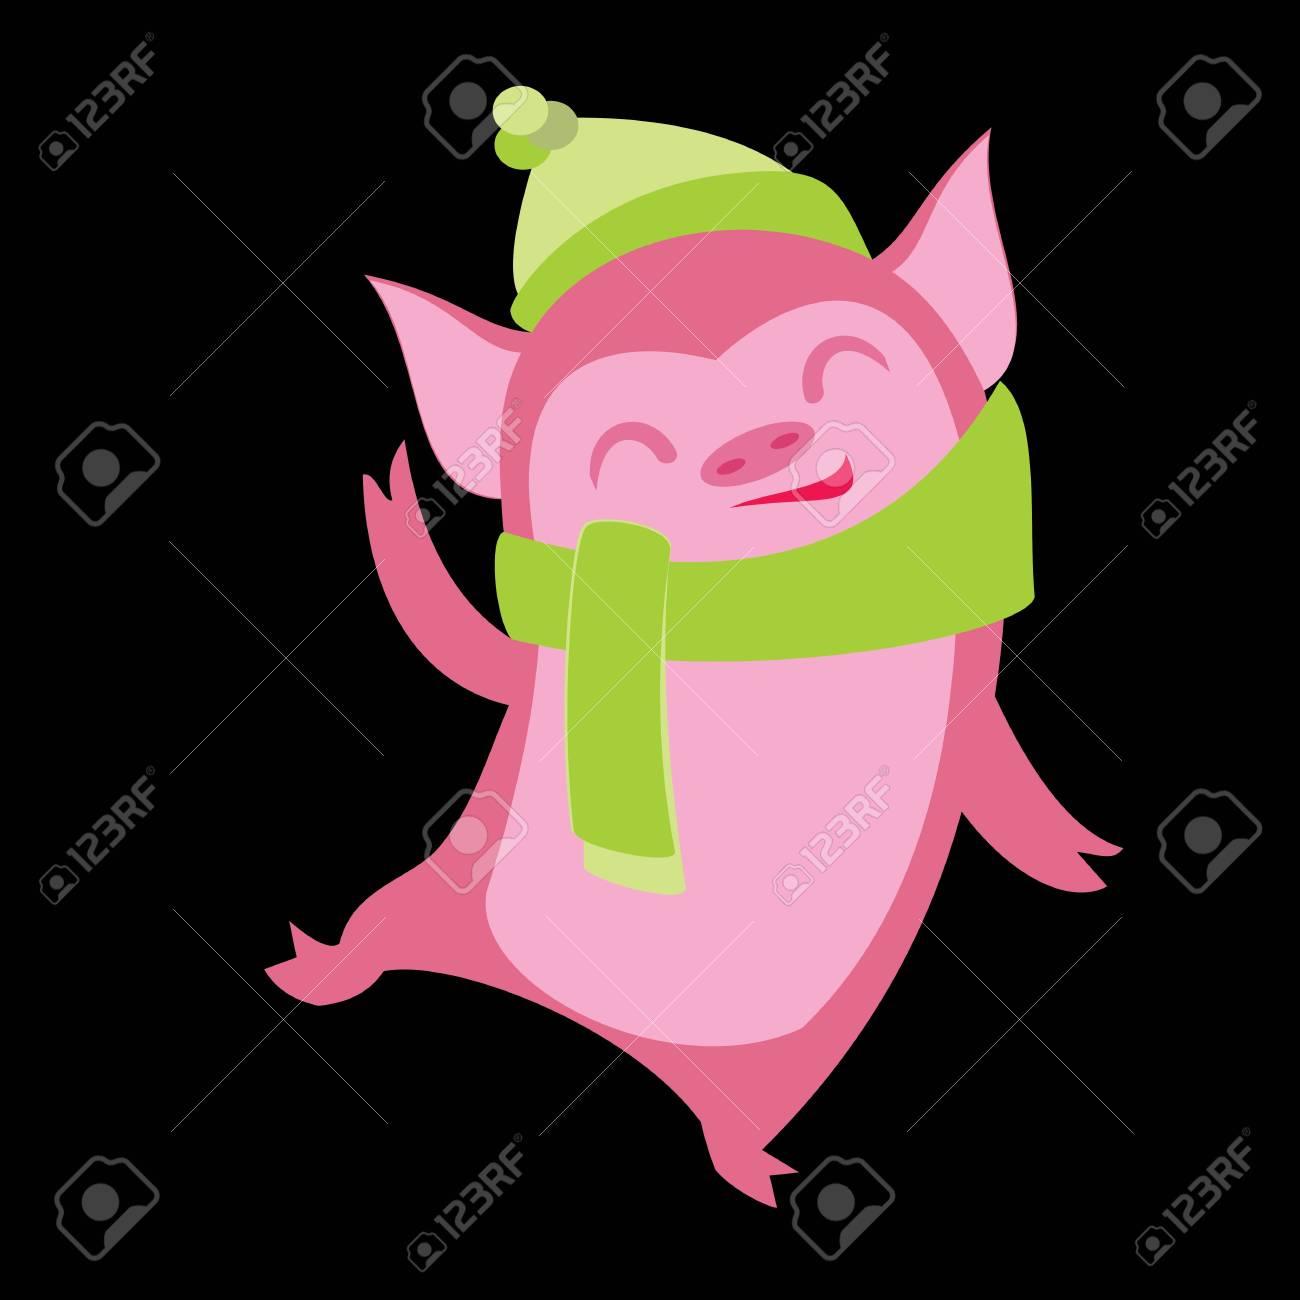 funny pig characters cartoon winter illustration of farm animals